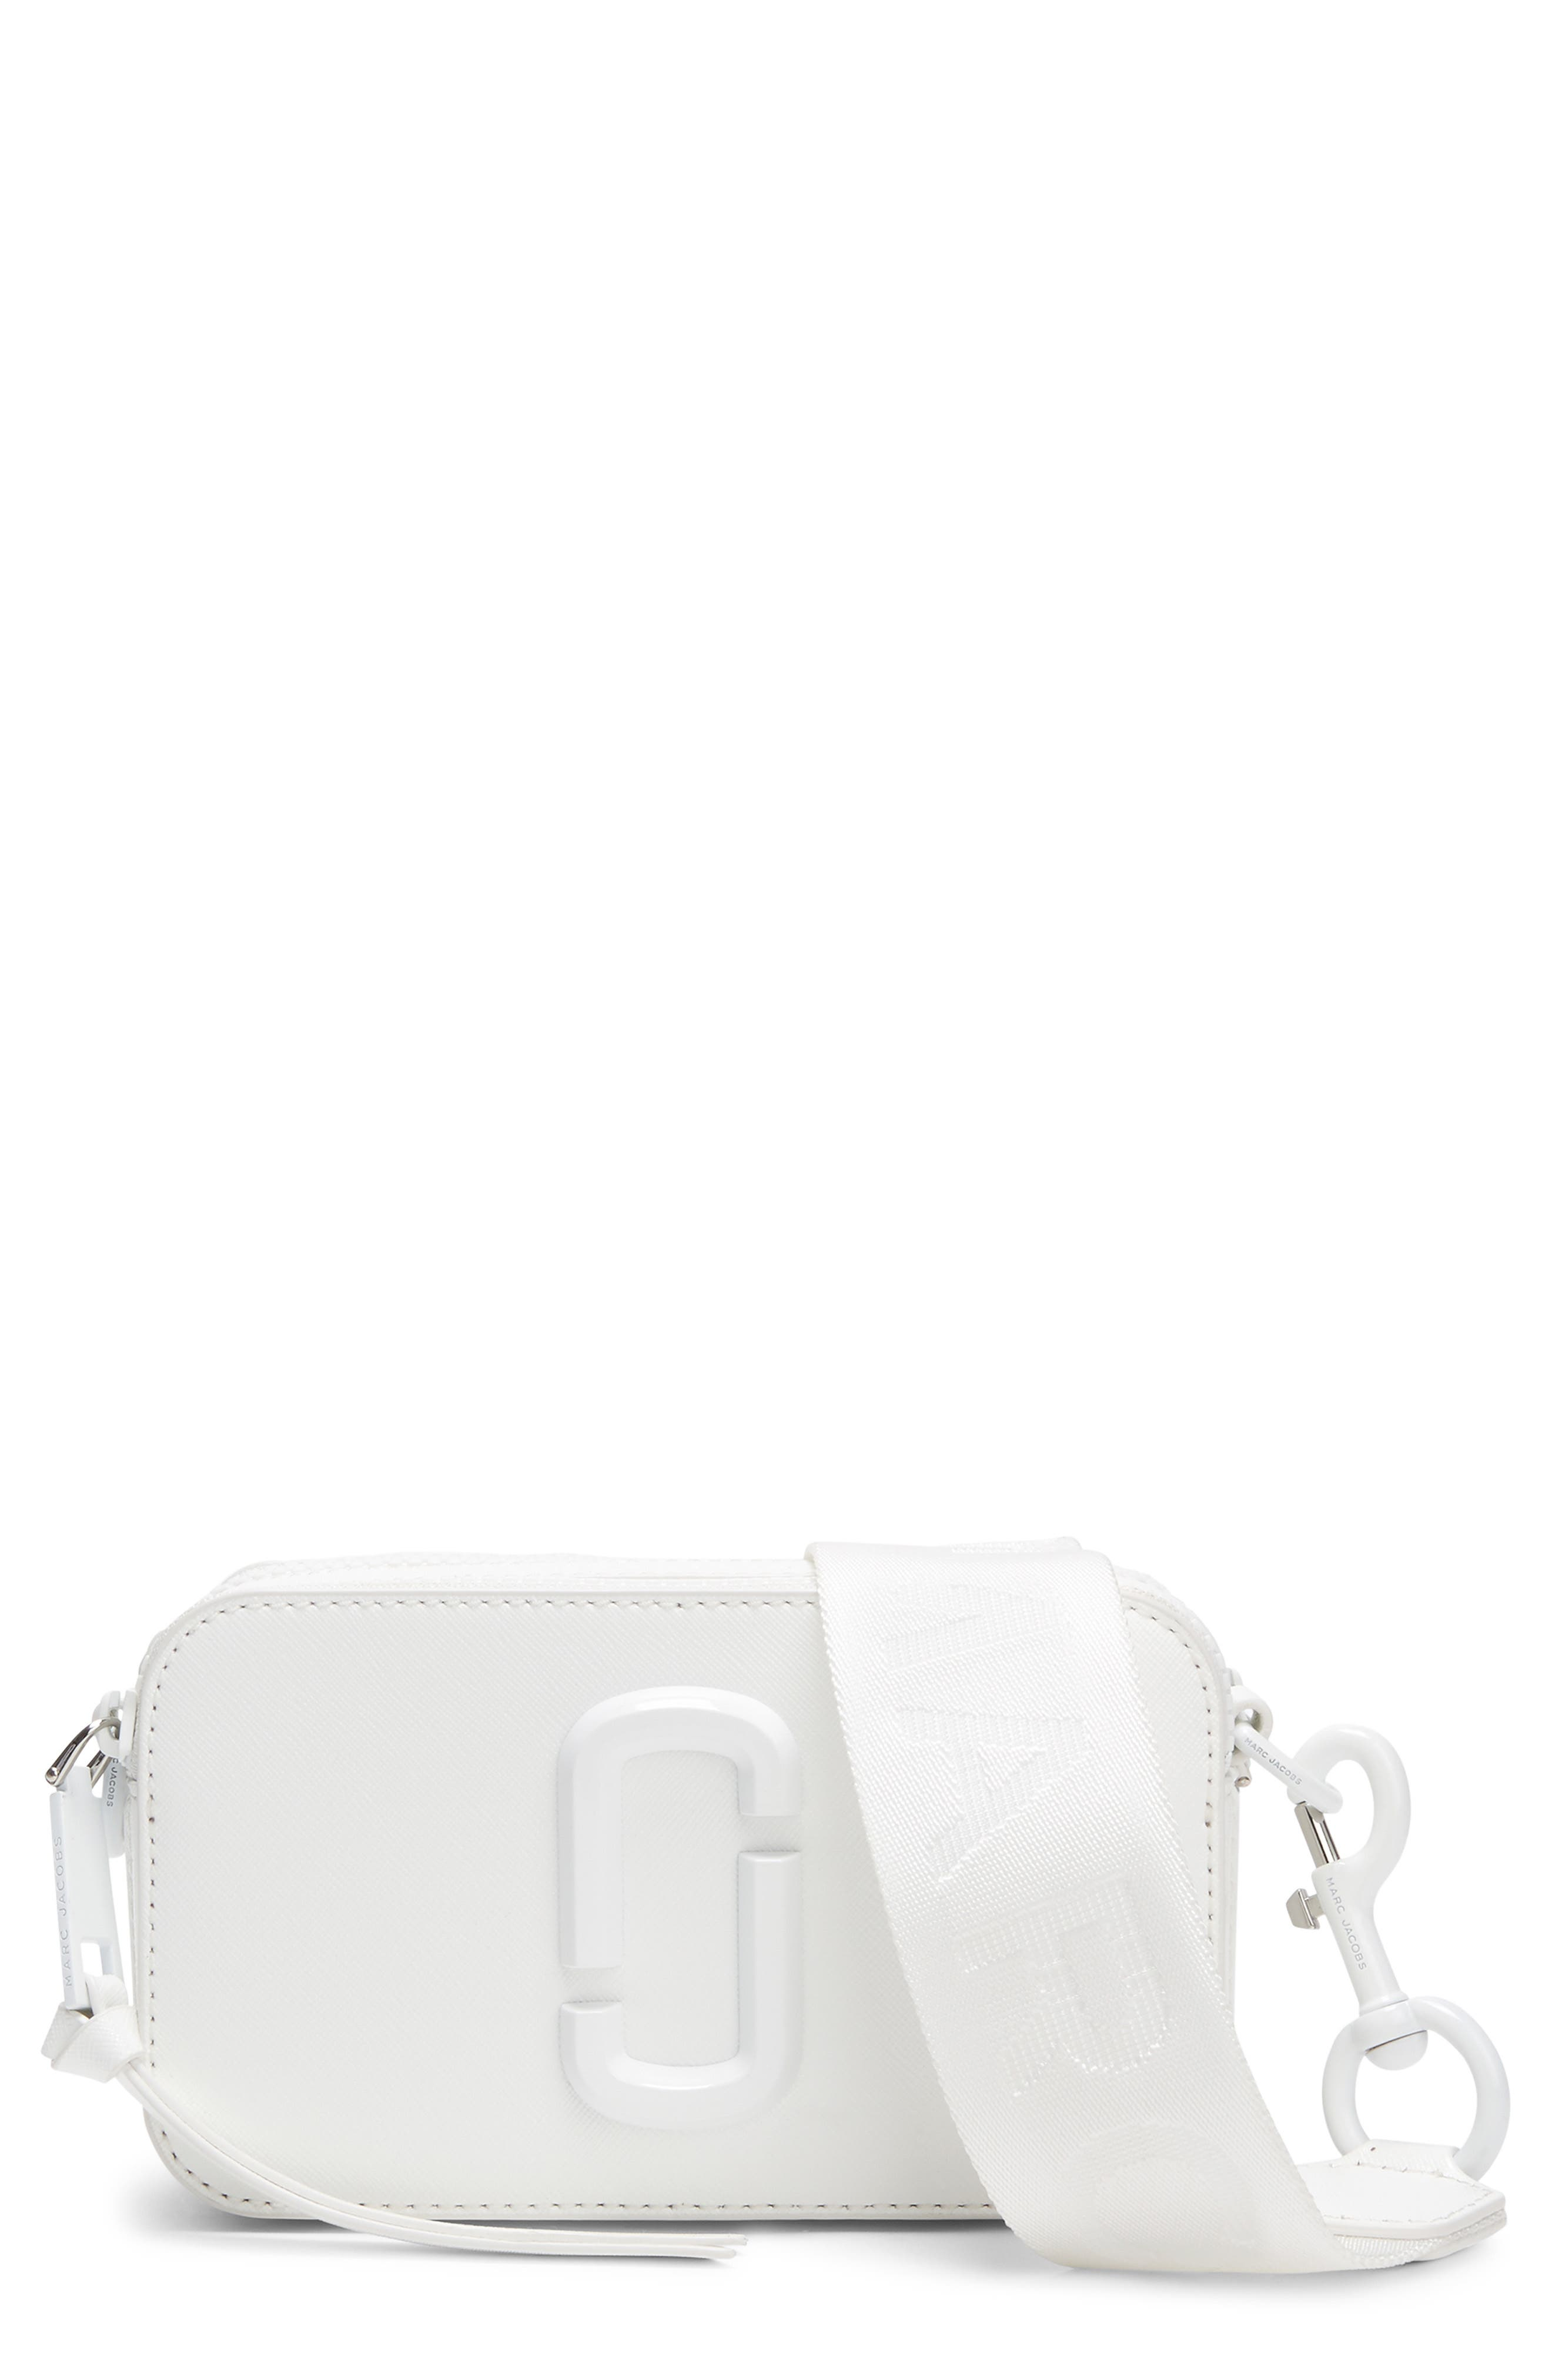 MARC JACOBS, Snapshot Leather Crossbody Bag, Main thumbnail 1, color, MOON WHITE